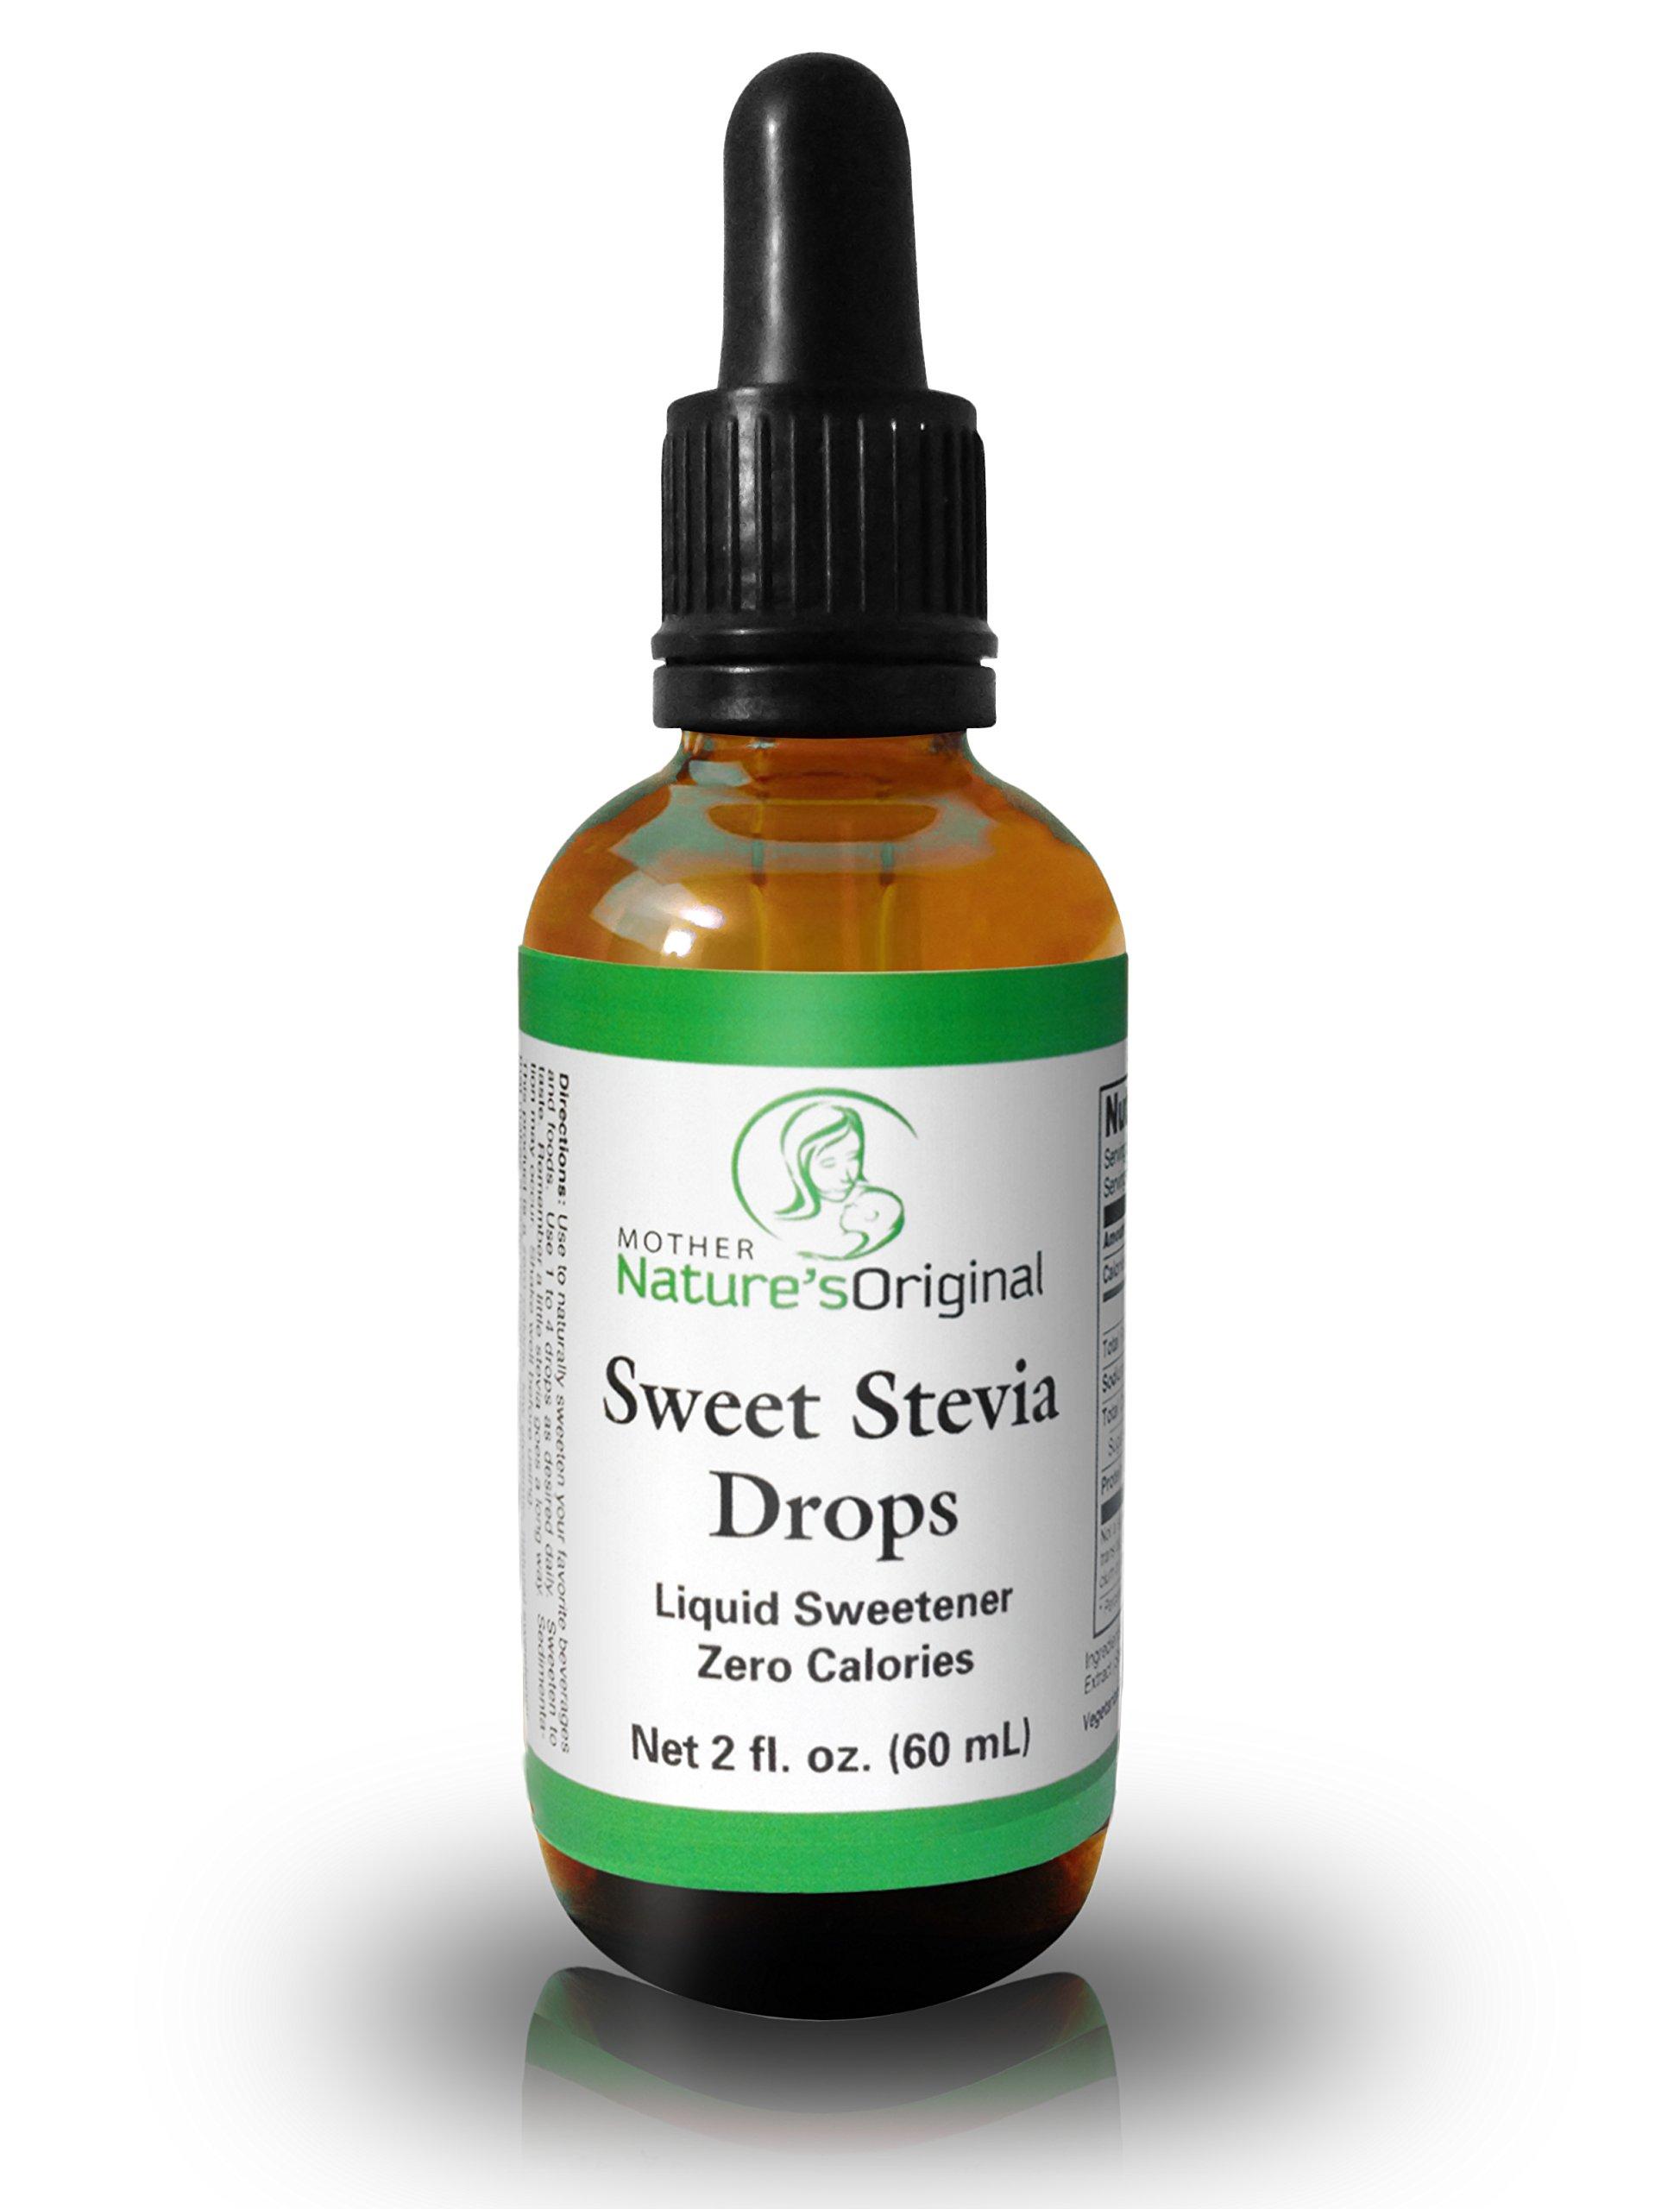 Liquid Sweet Stevia Drops for Coffee, Tea & Healthy Baking - Sugar Free, Zero Calorie Alternative Sweetener & Sugar Substitute, 2 Fl. Oz.